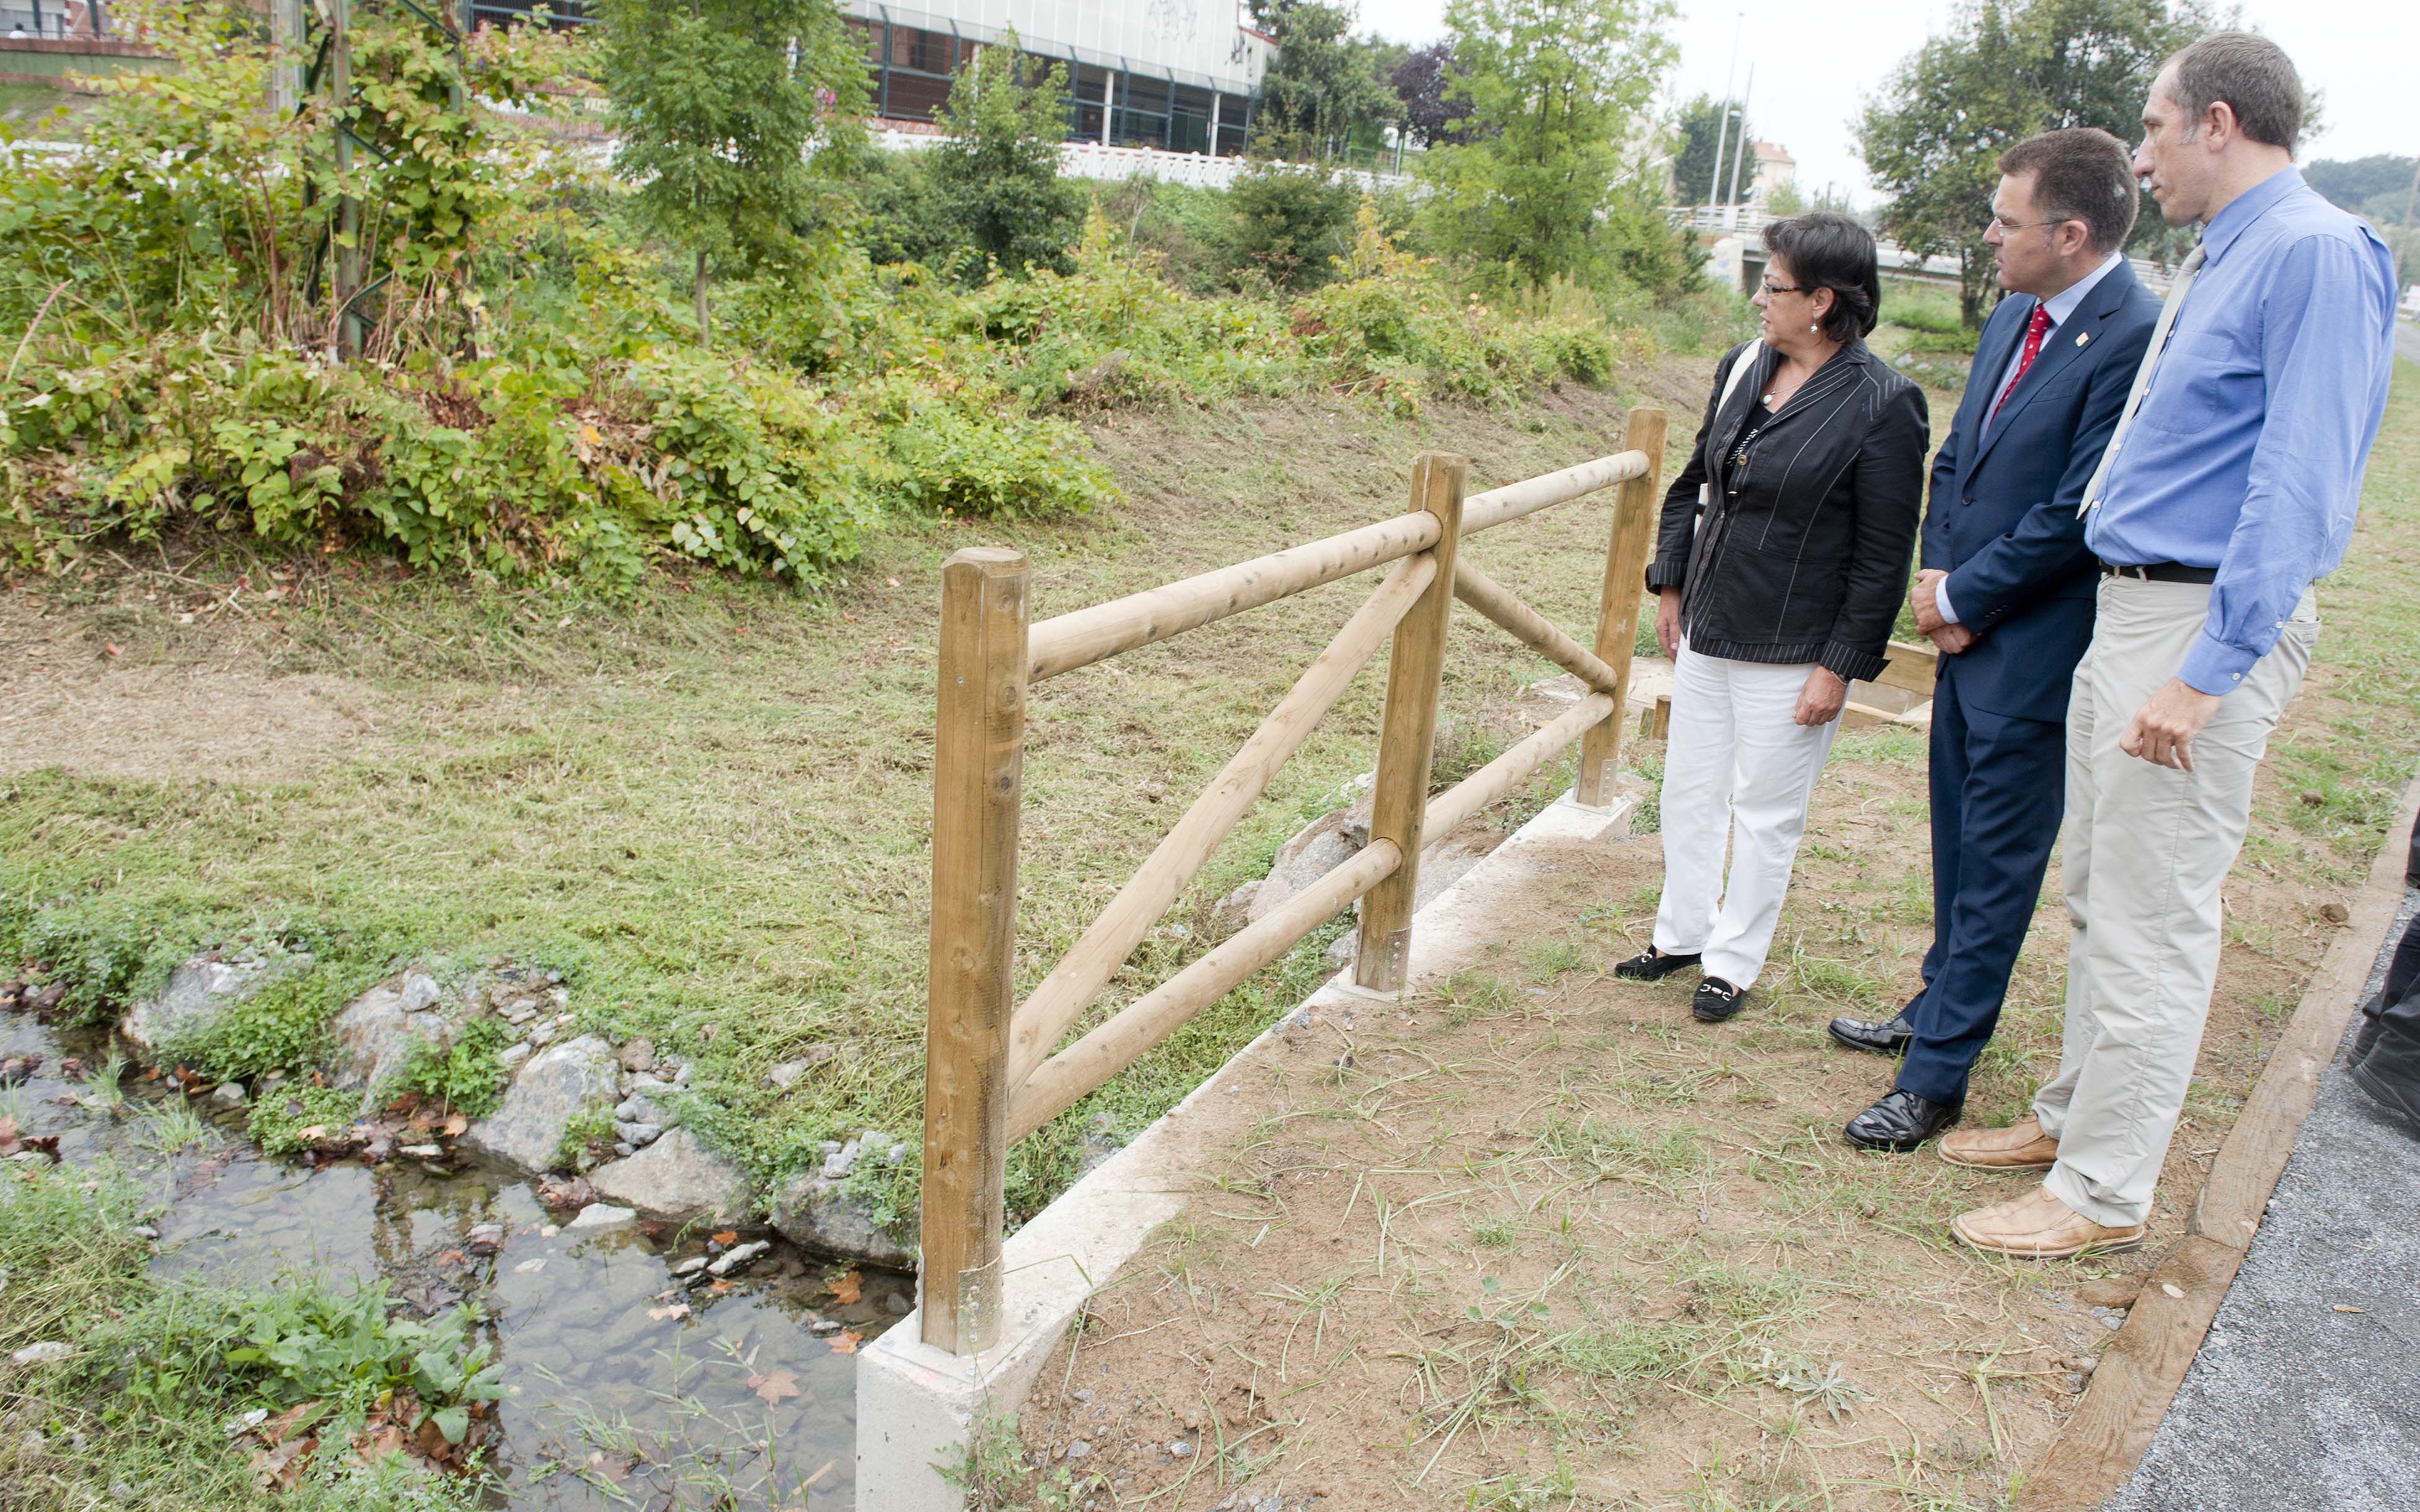 2011_09_16_agricultura_ura_gobelas_puente2.jpg